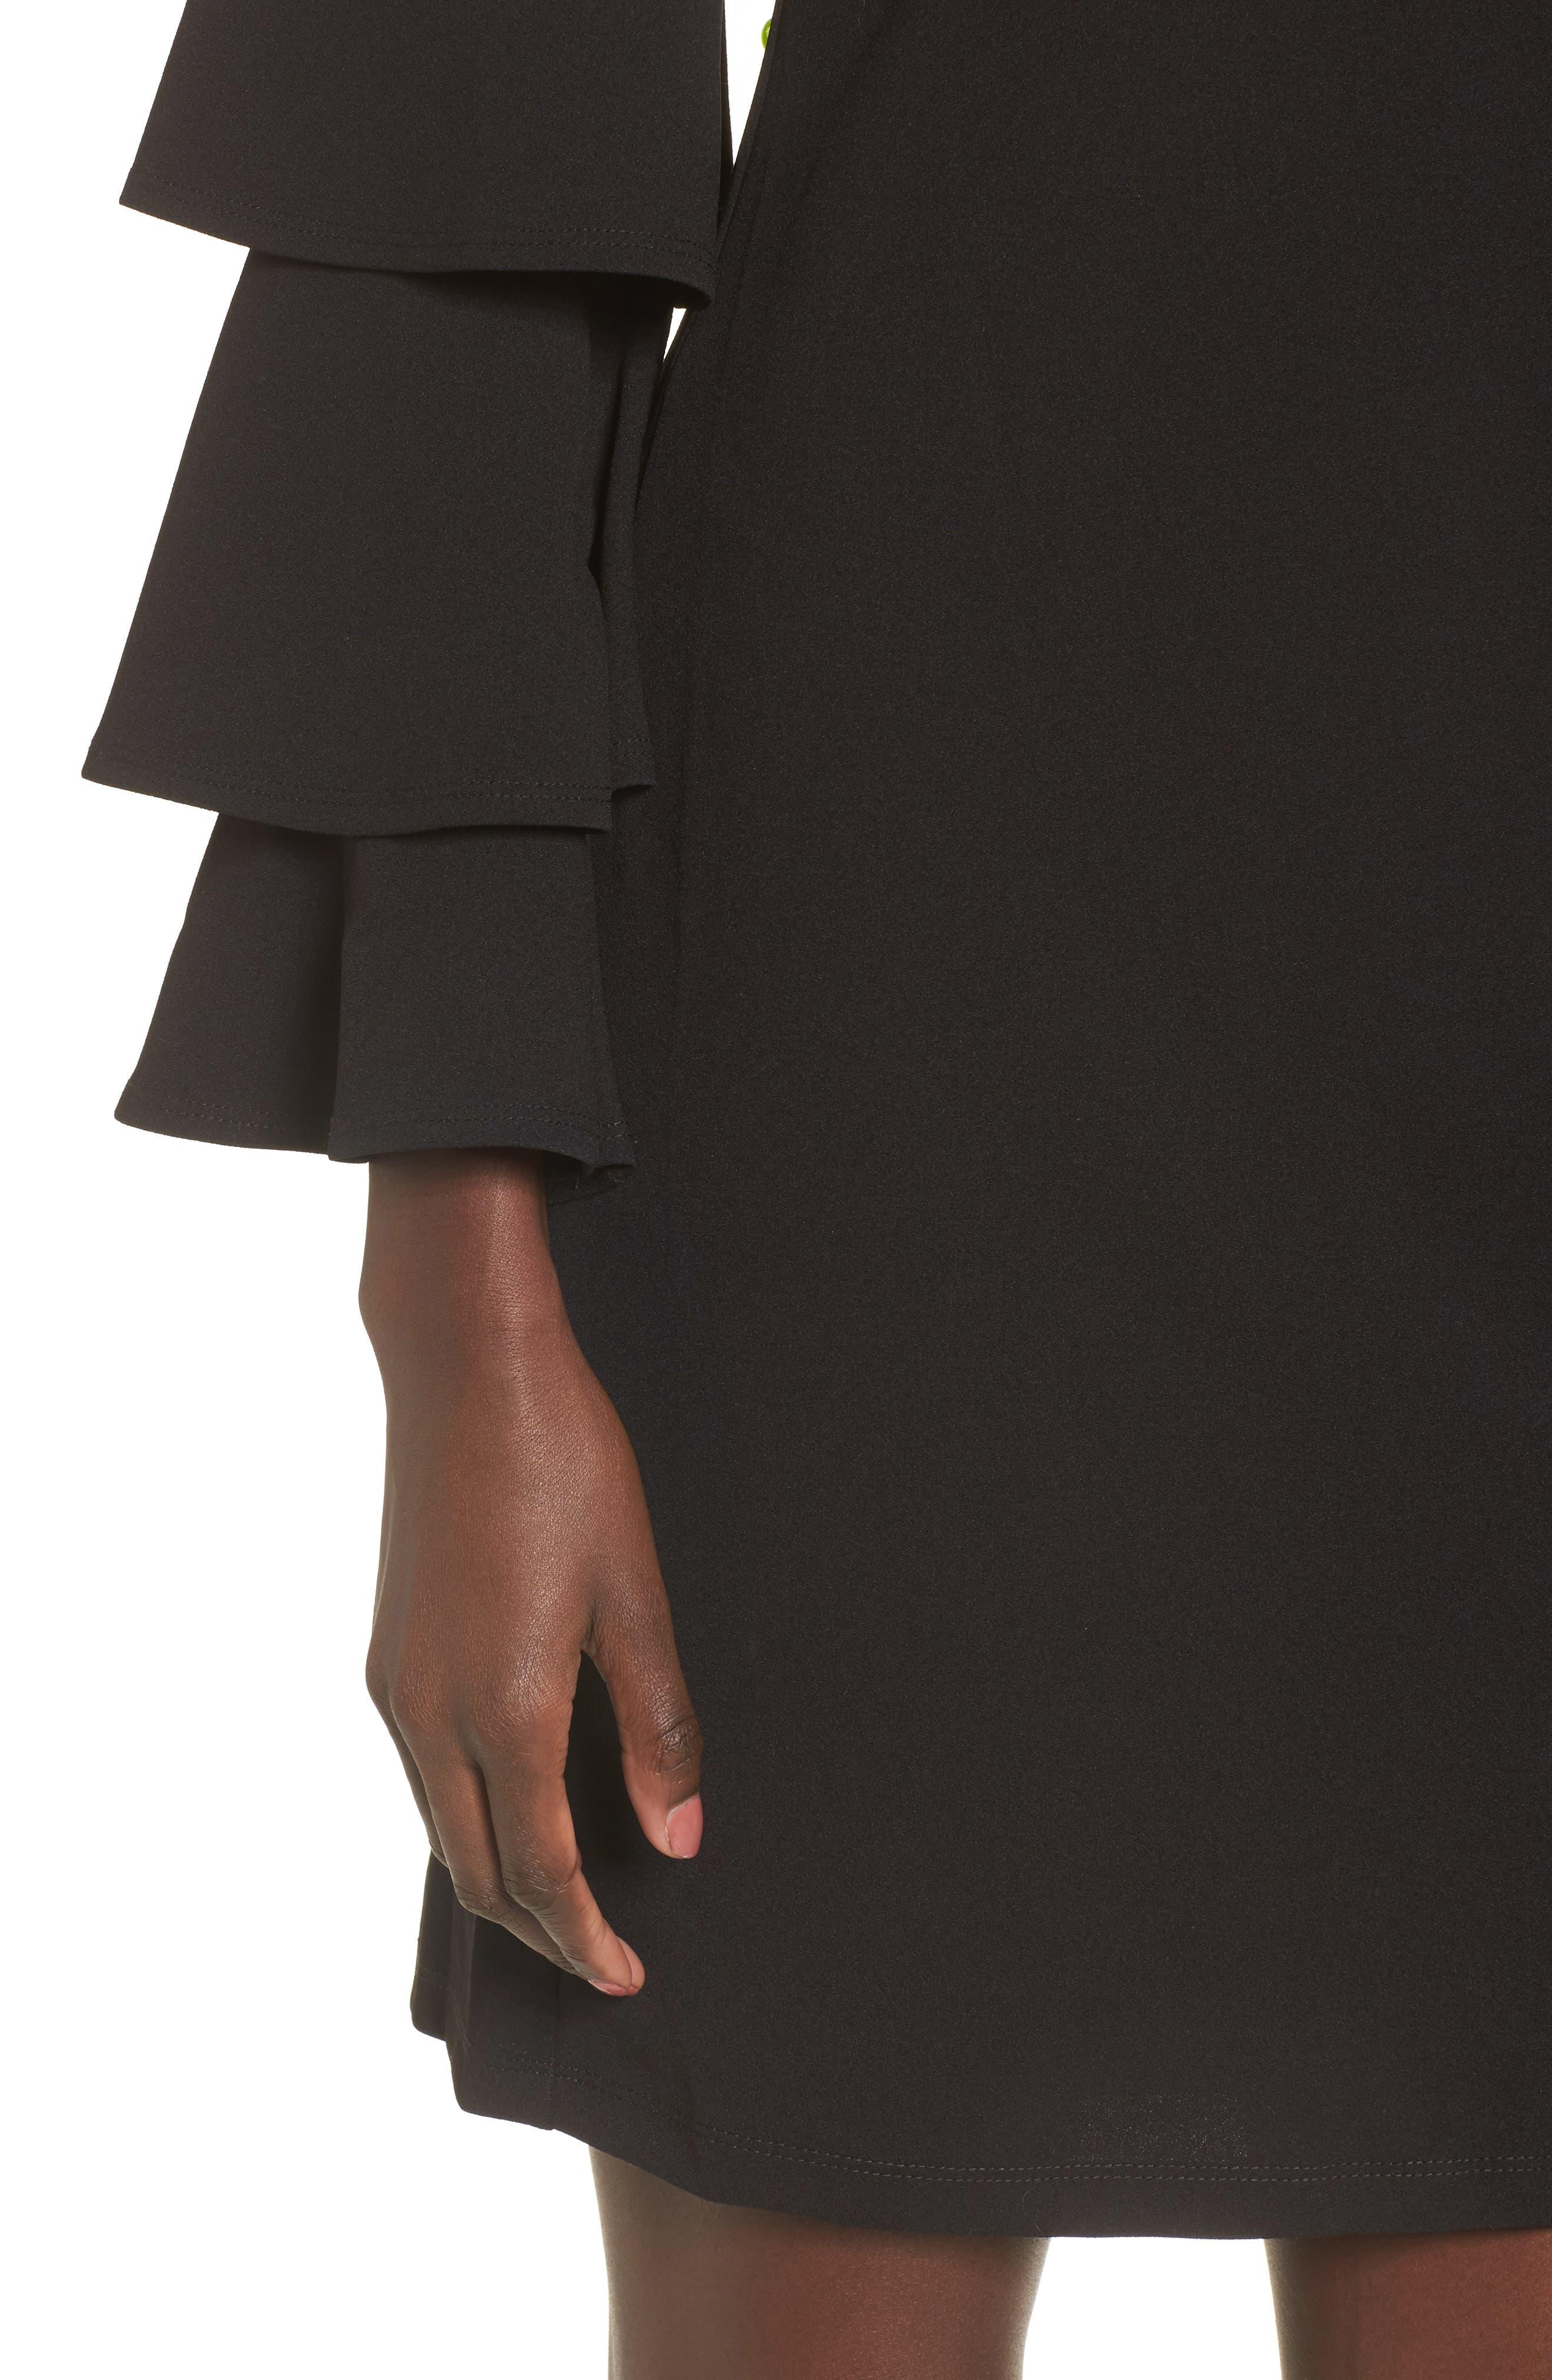 Ruffle Sleeve Off the Shoulder Dress,                             Alternate thumbnail 4, color,                             Black